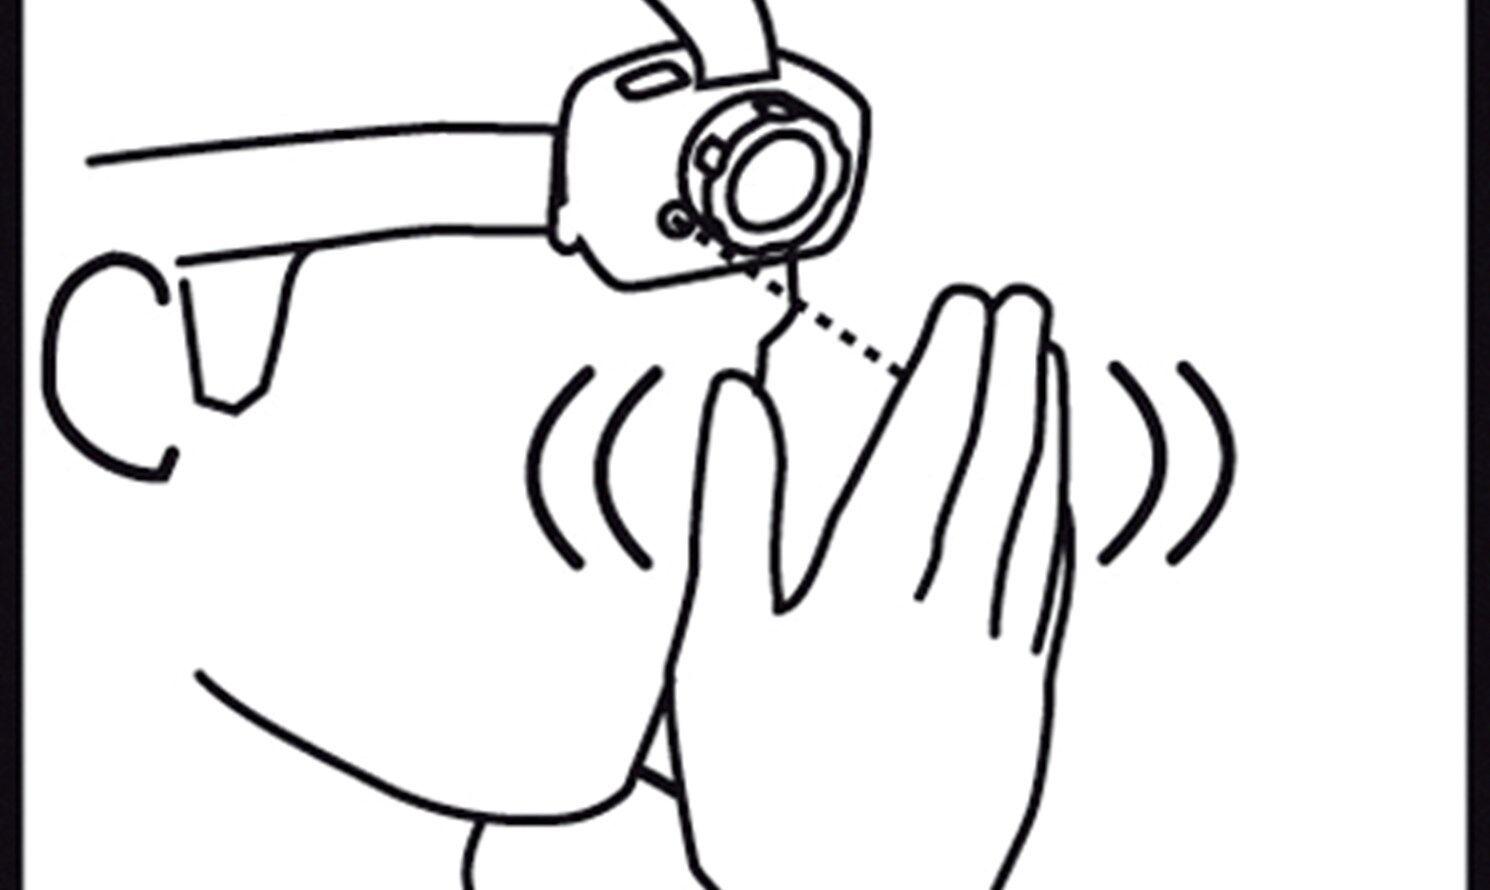 SCANGRIP SENSORE SENSORE SENSORE 1W CREE XP- E Wave, mani libere LED 40m FARETTO de1afb